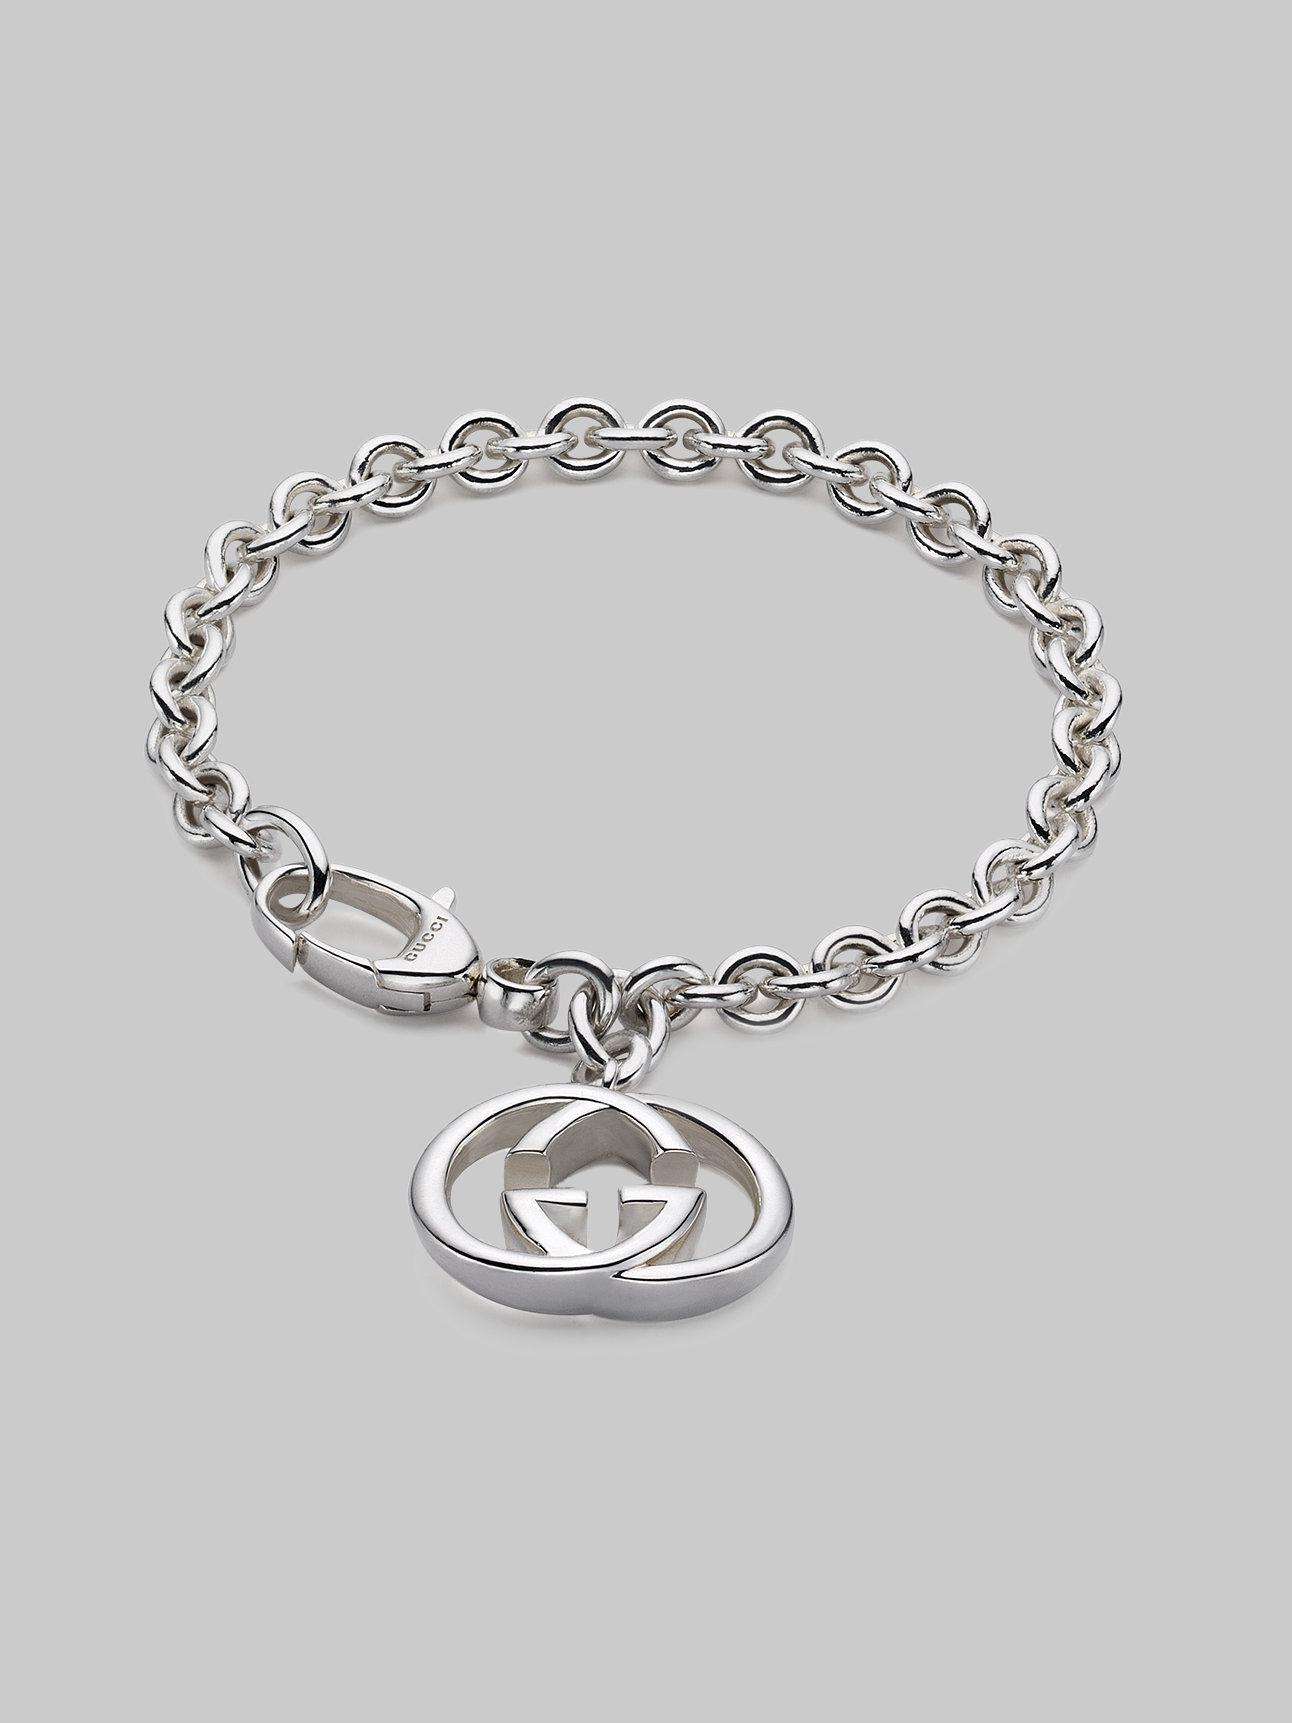 5606a2af3 Gucci Heart Charm Bracelet Selfridgescom